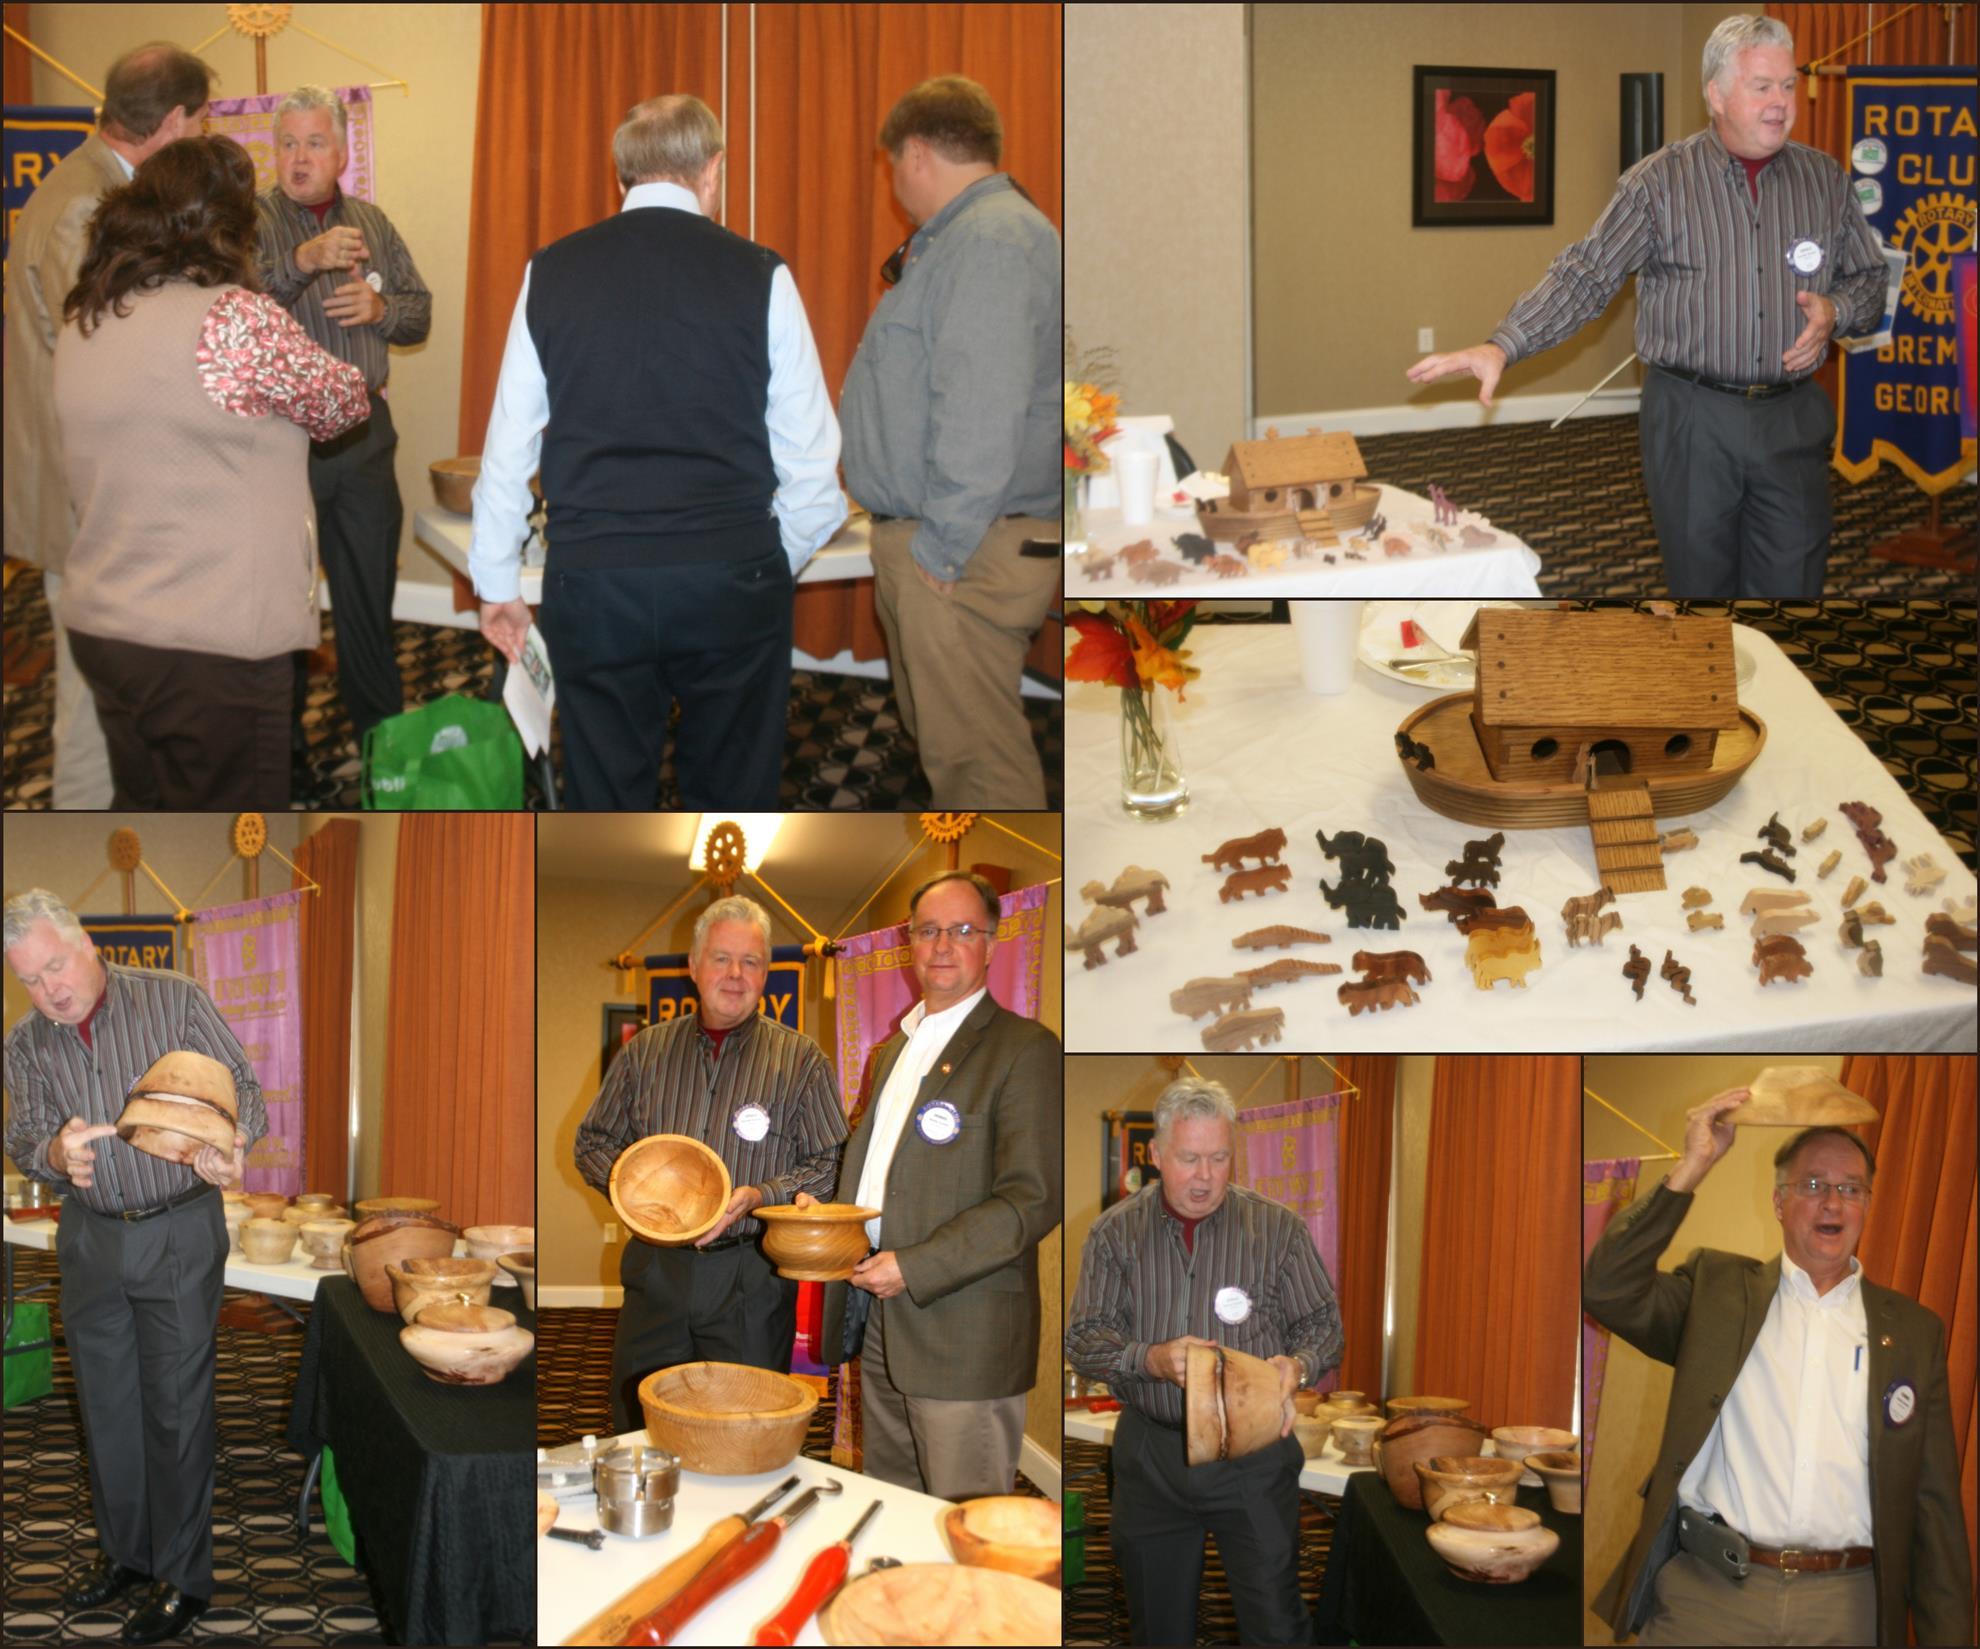 Stories | Rotary Club of Bremen